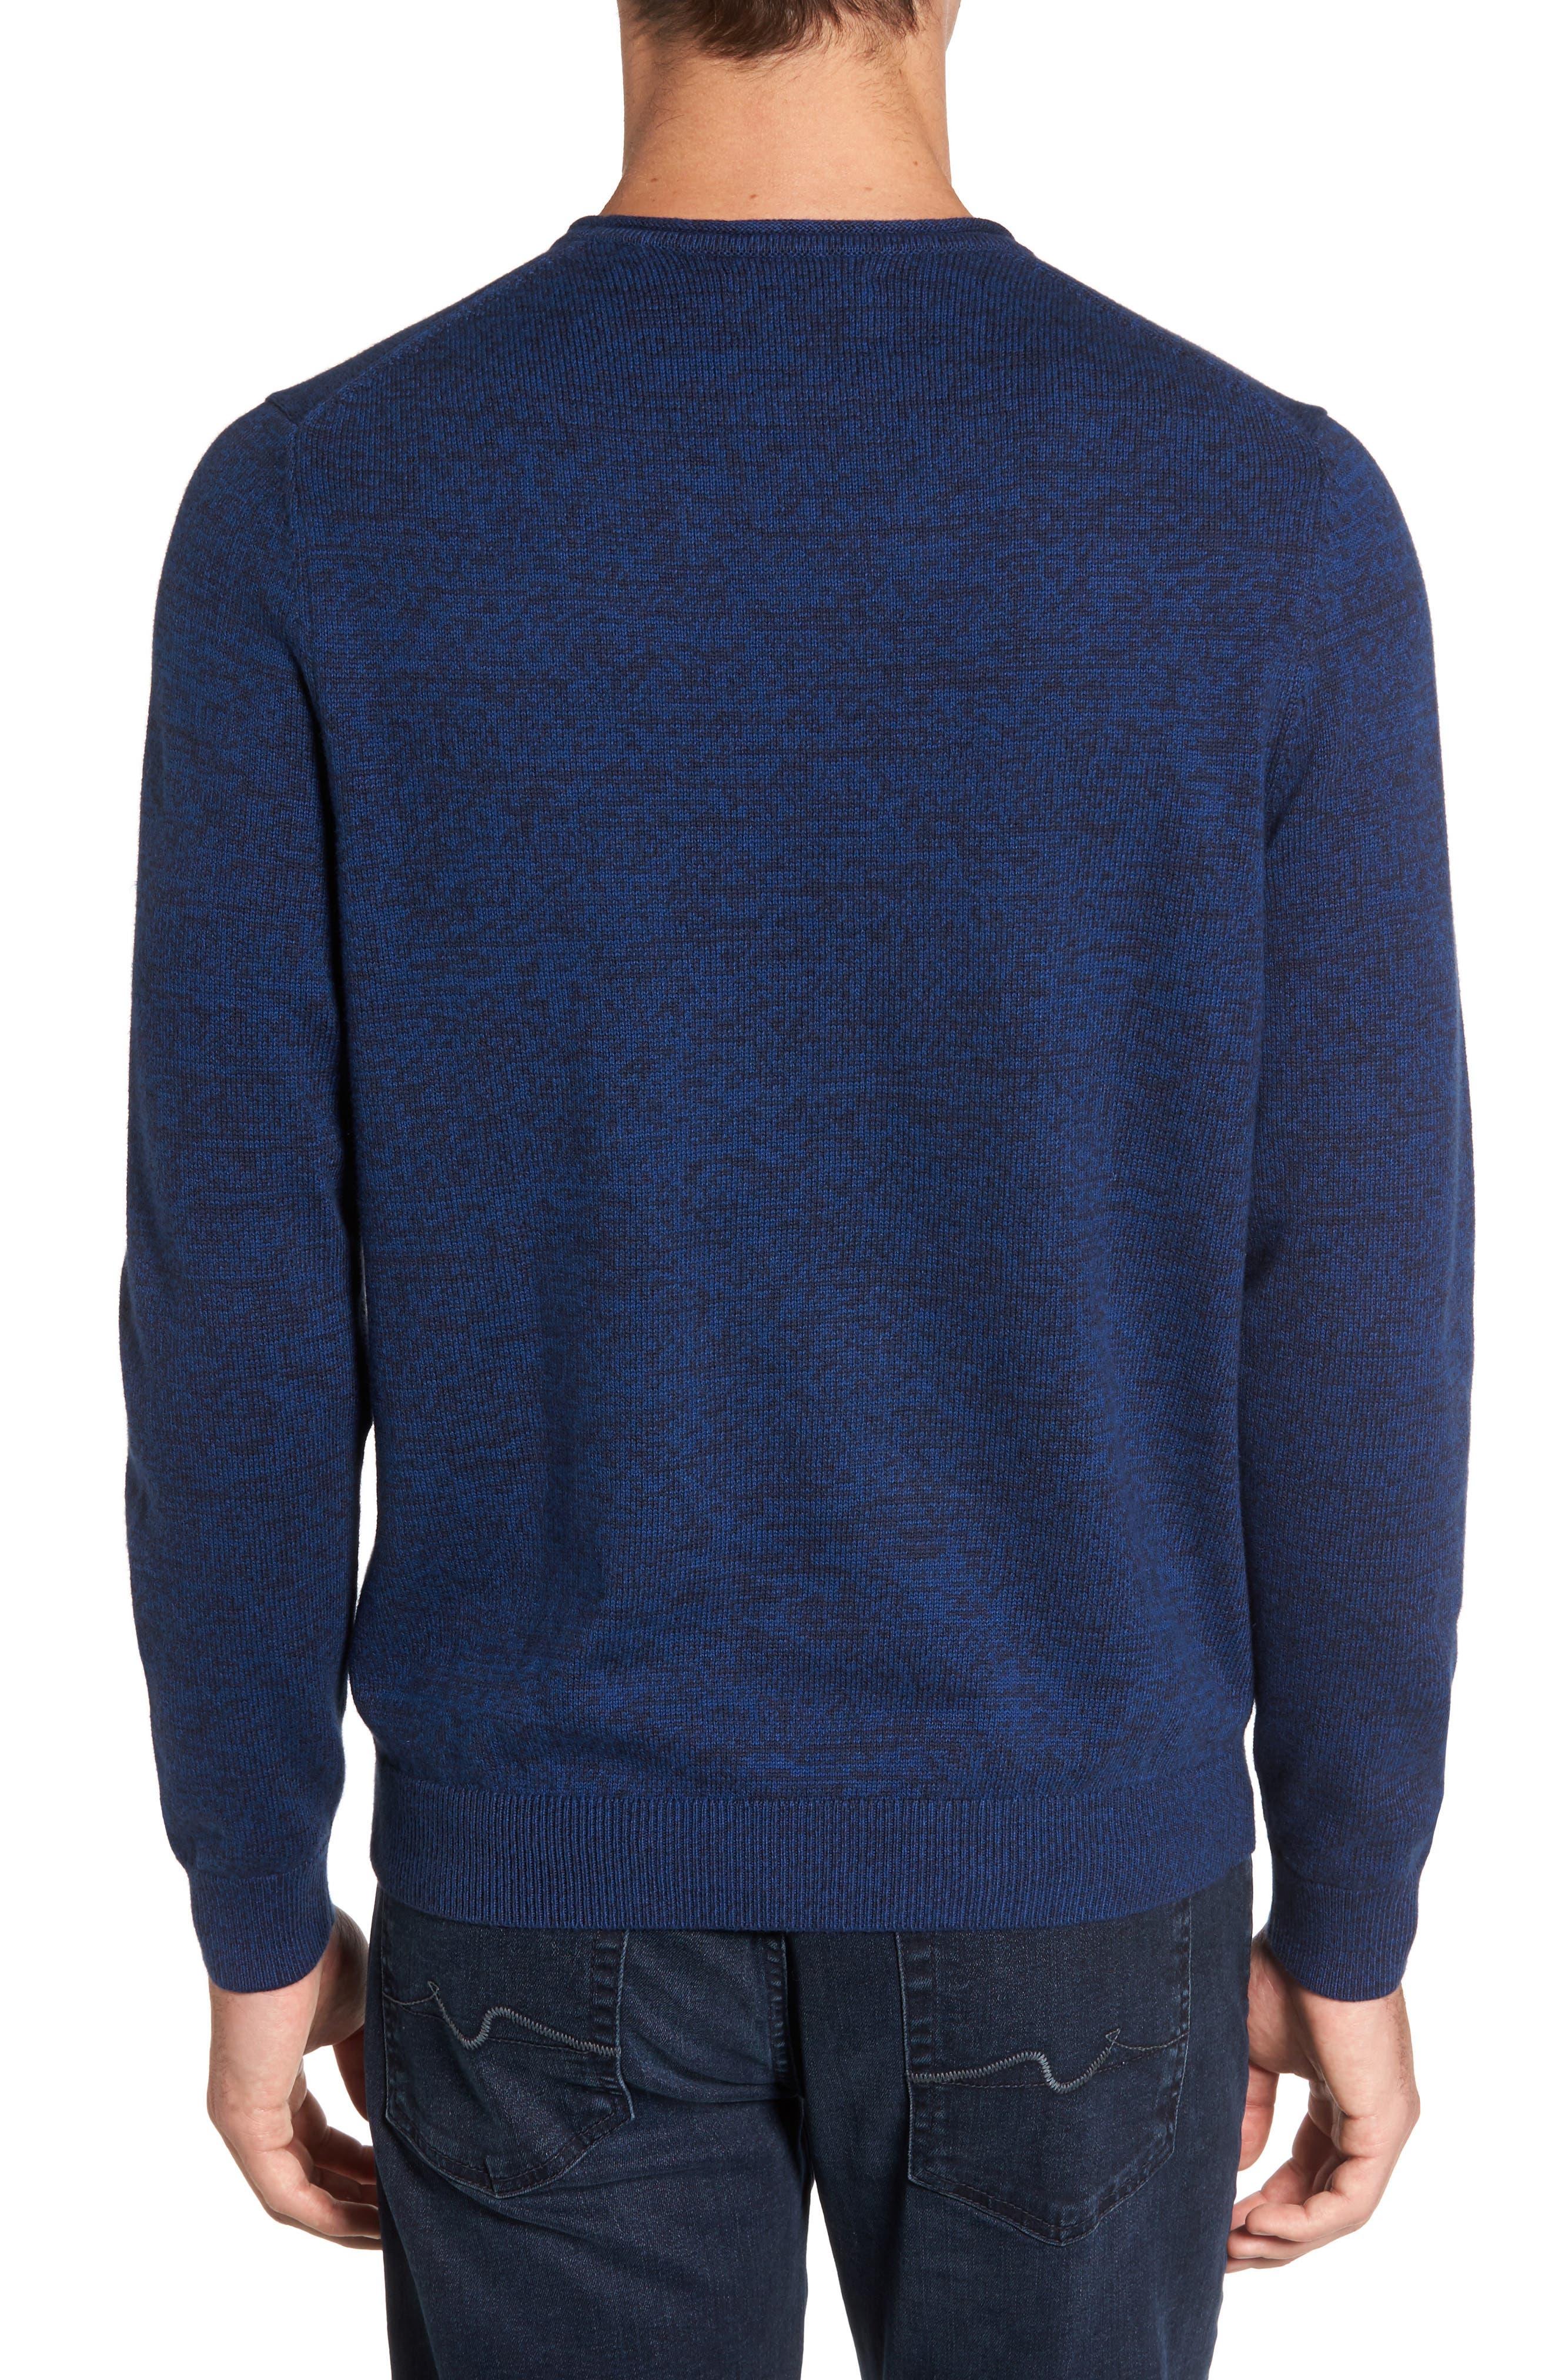 Alternate Image 2  - Nordstrom Men's Shop Cotton & Cashmere Roll Neck Sweater